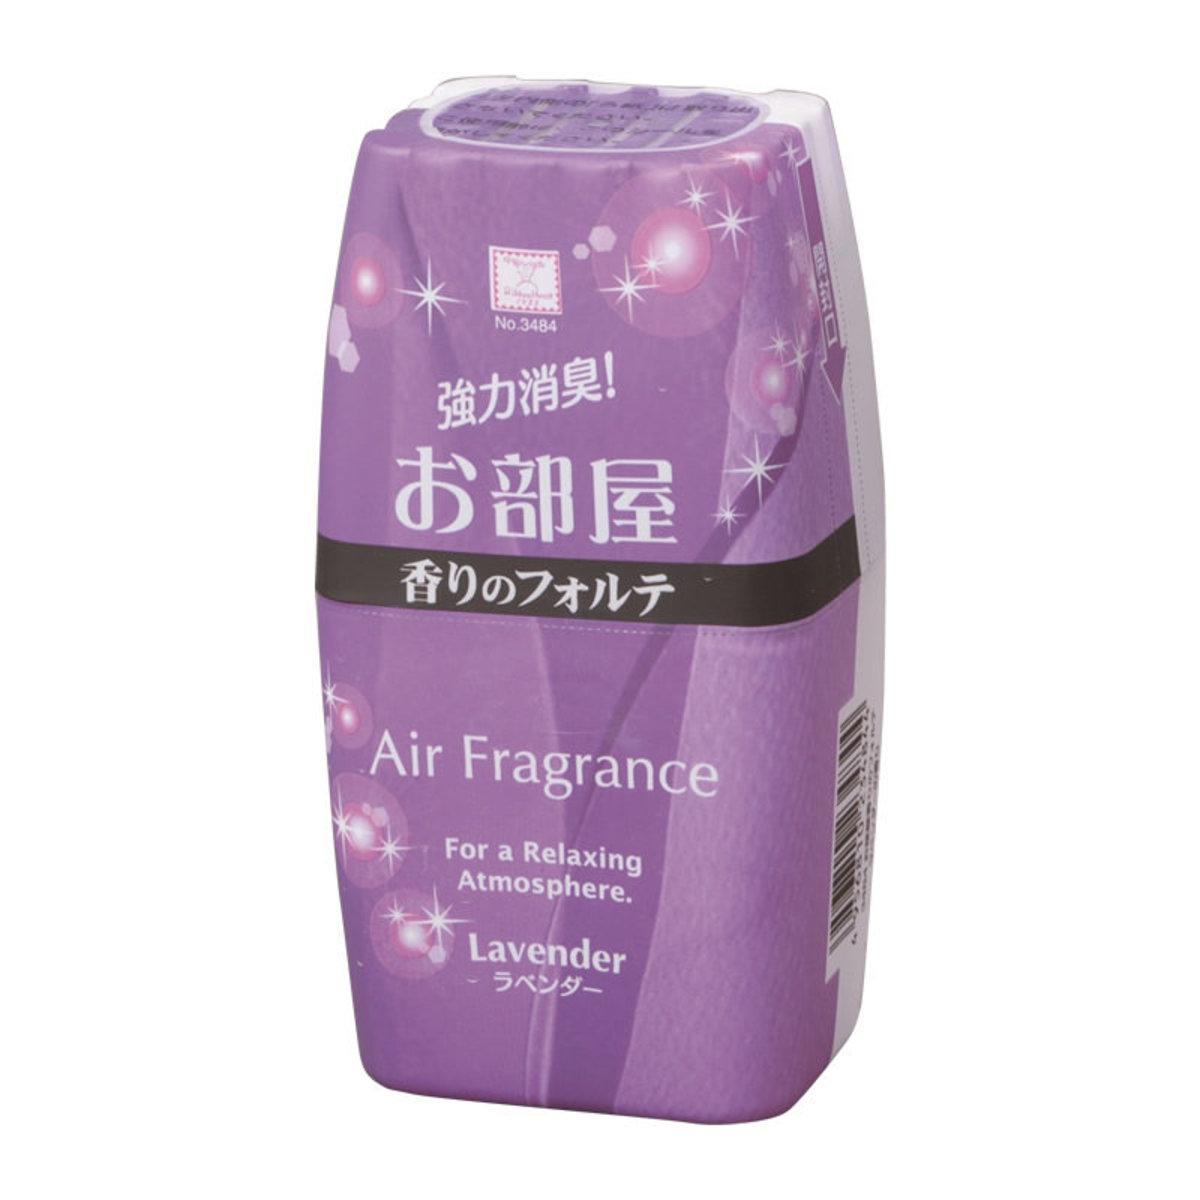 Japan import Indoor Air Freshener Deodorant & Aromatic for Indoor (Lavender)